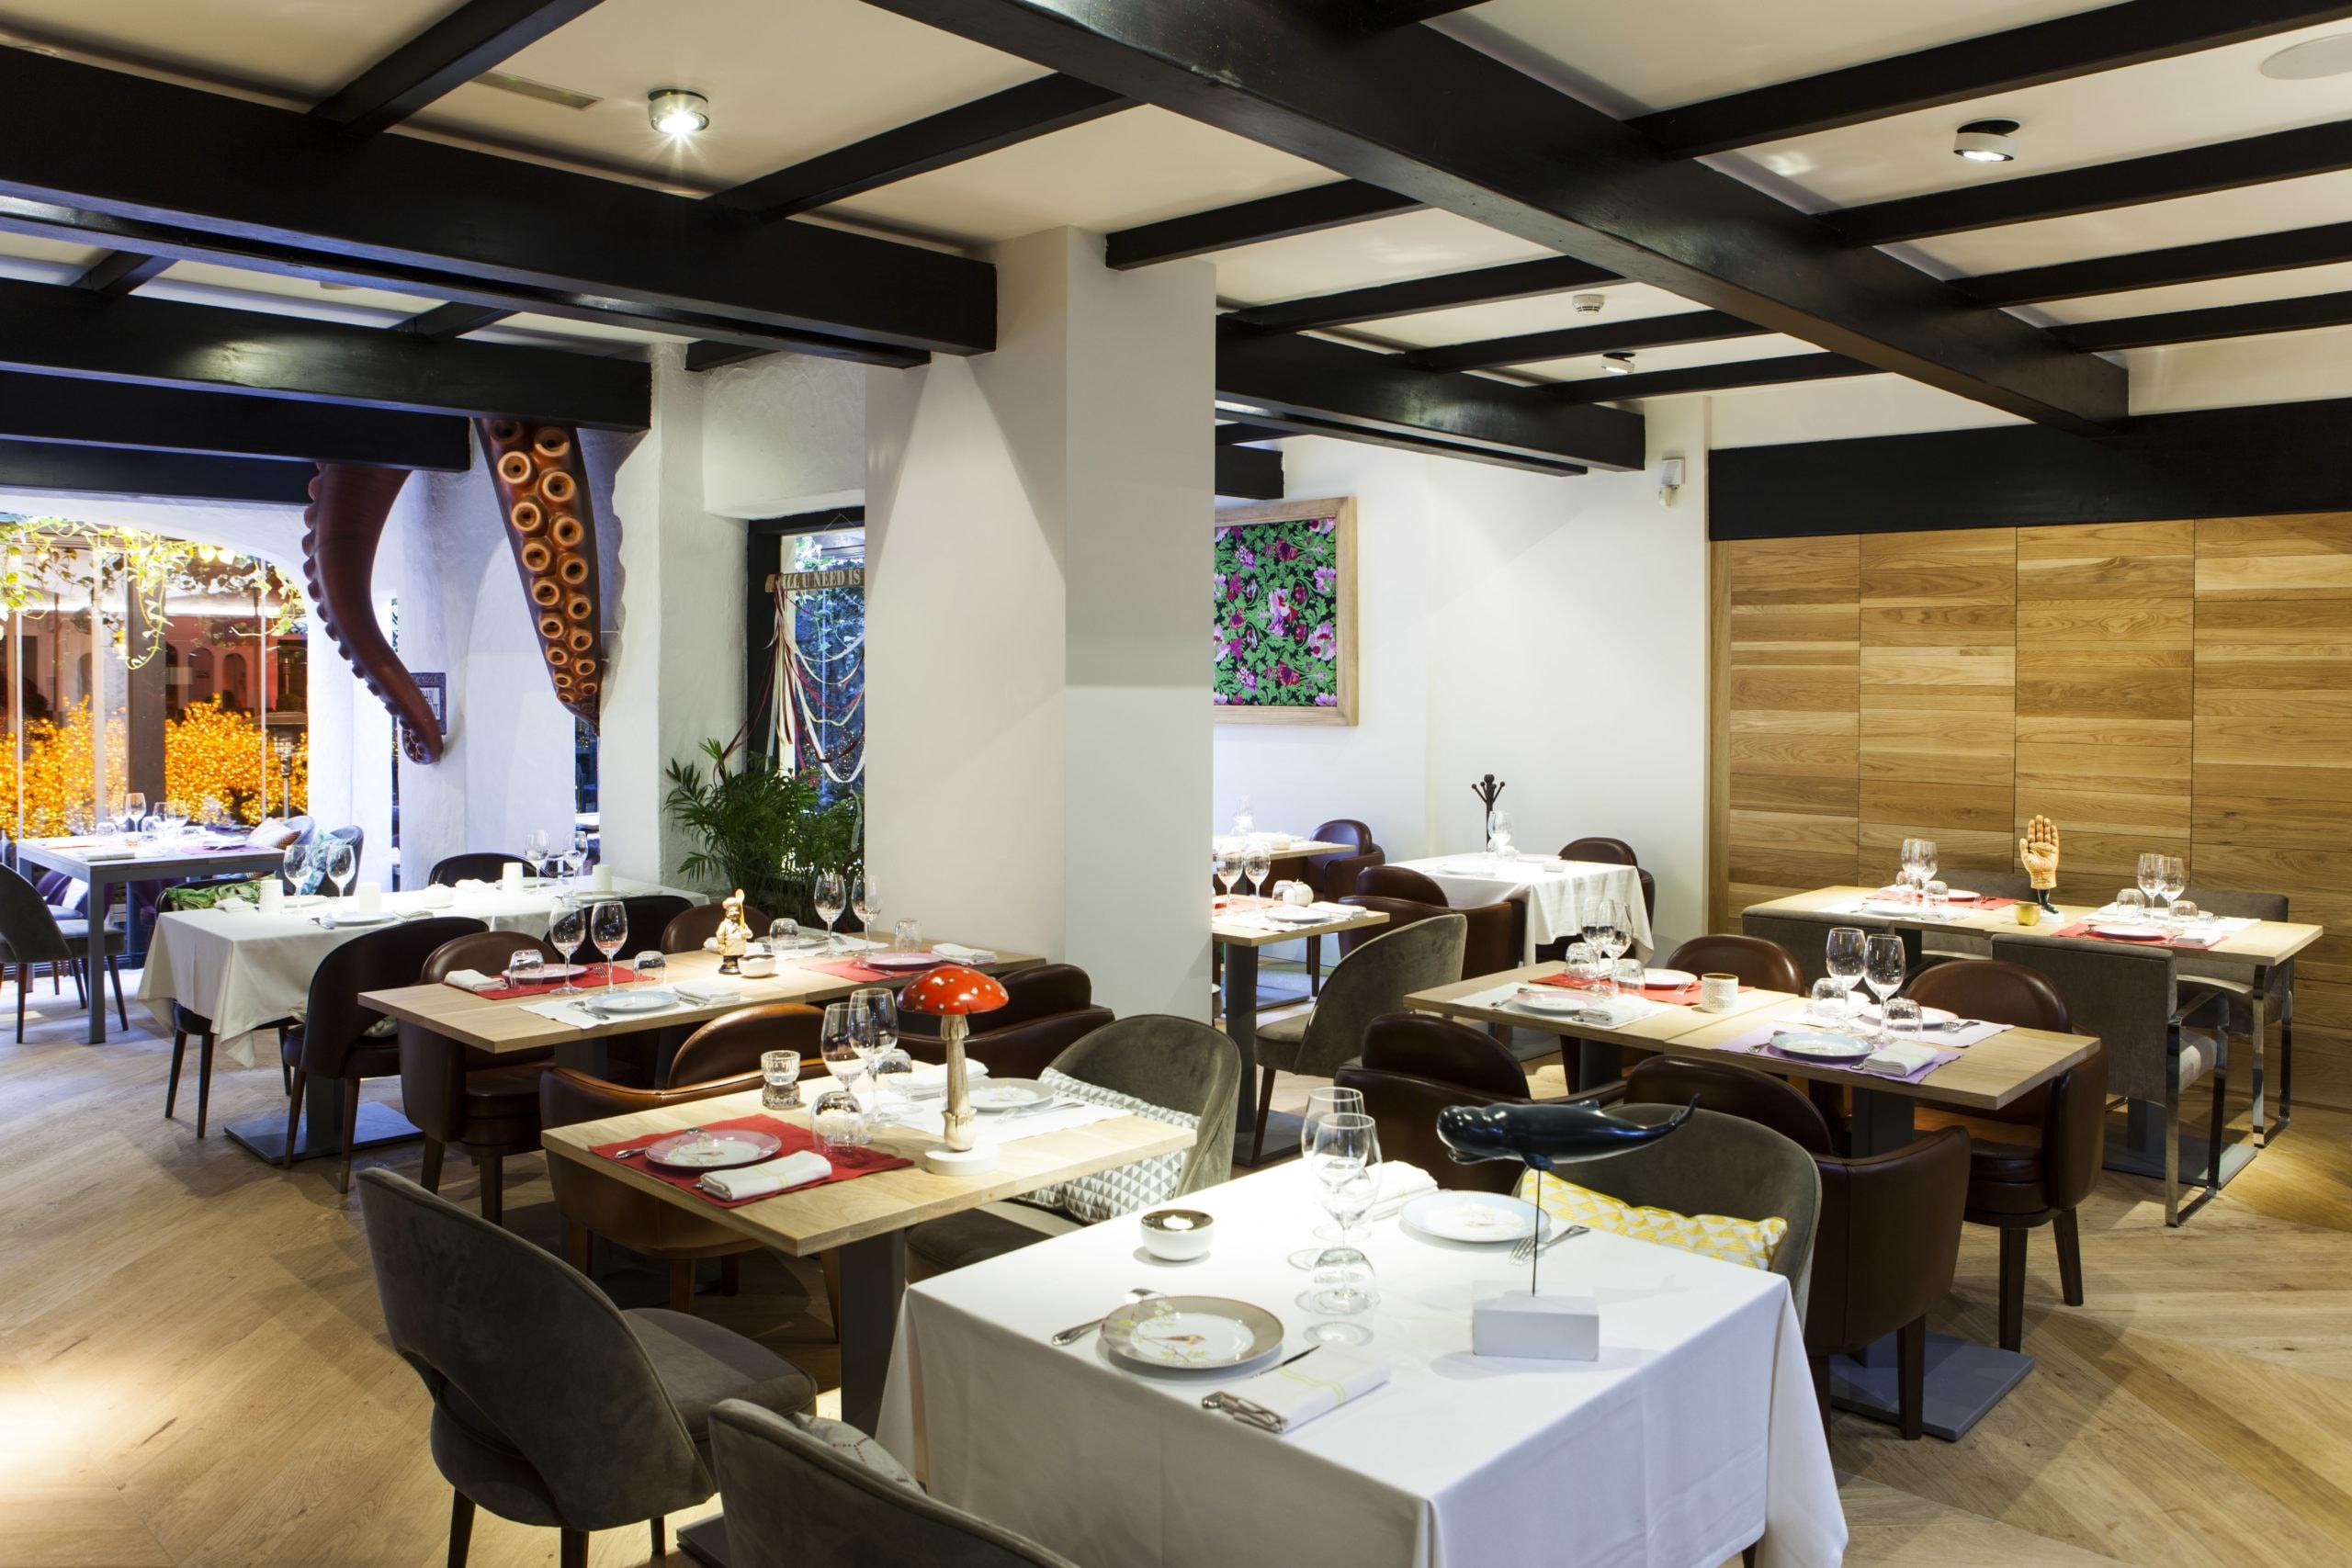 BiBo Marbella restaurant interior